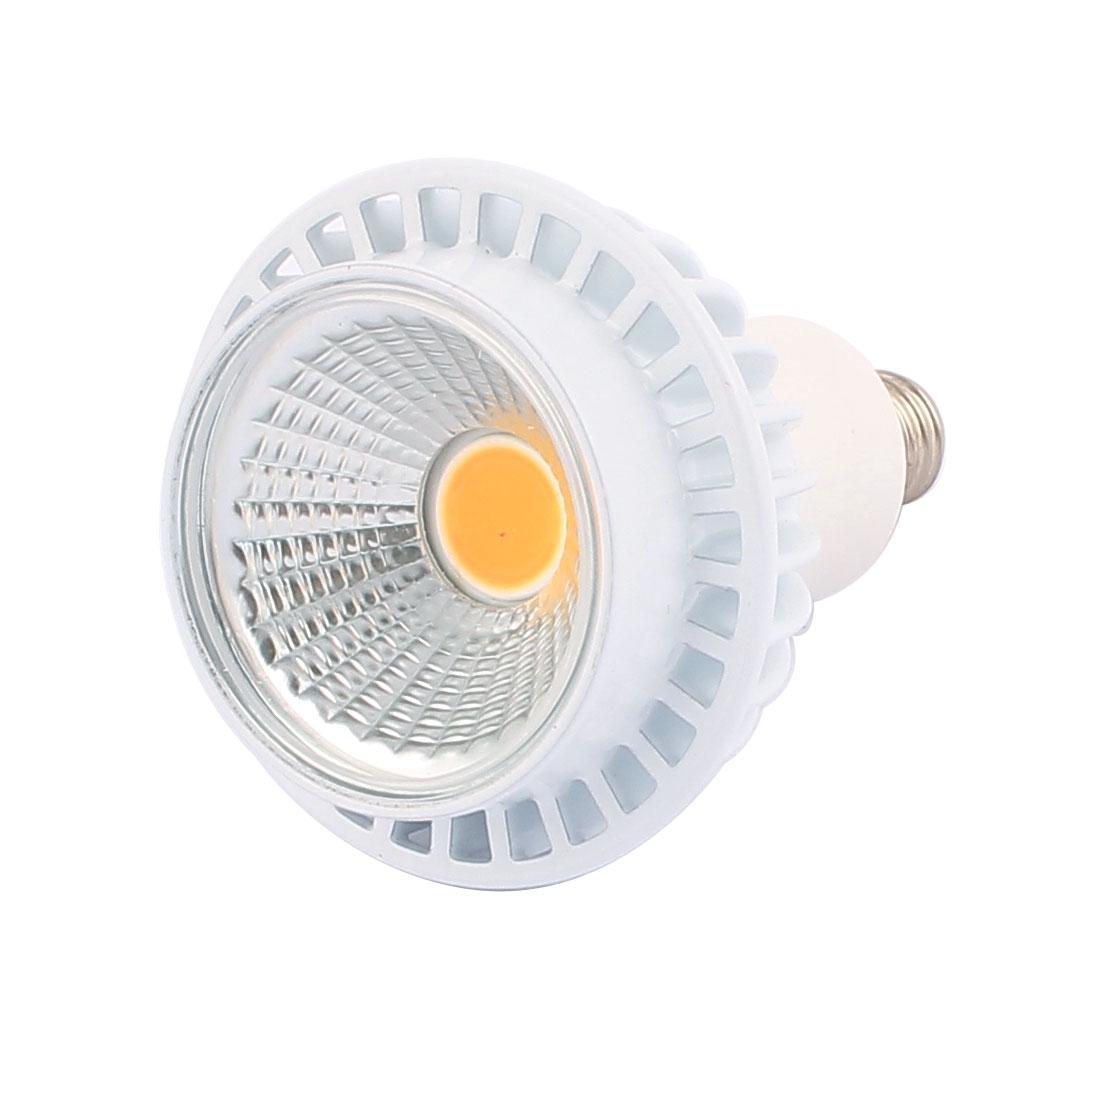 AC85-265V 3W E11 COB LED Spotlight Lamp Bulb Practical Downlight Warm White